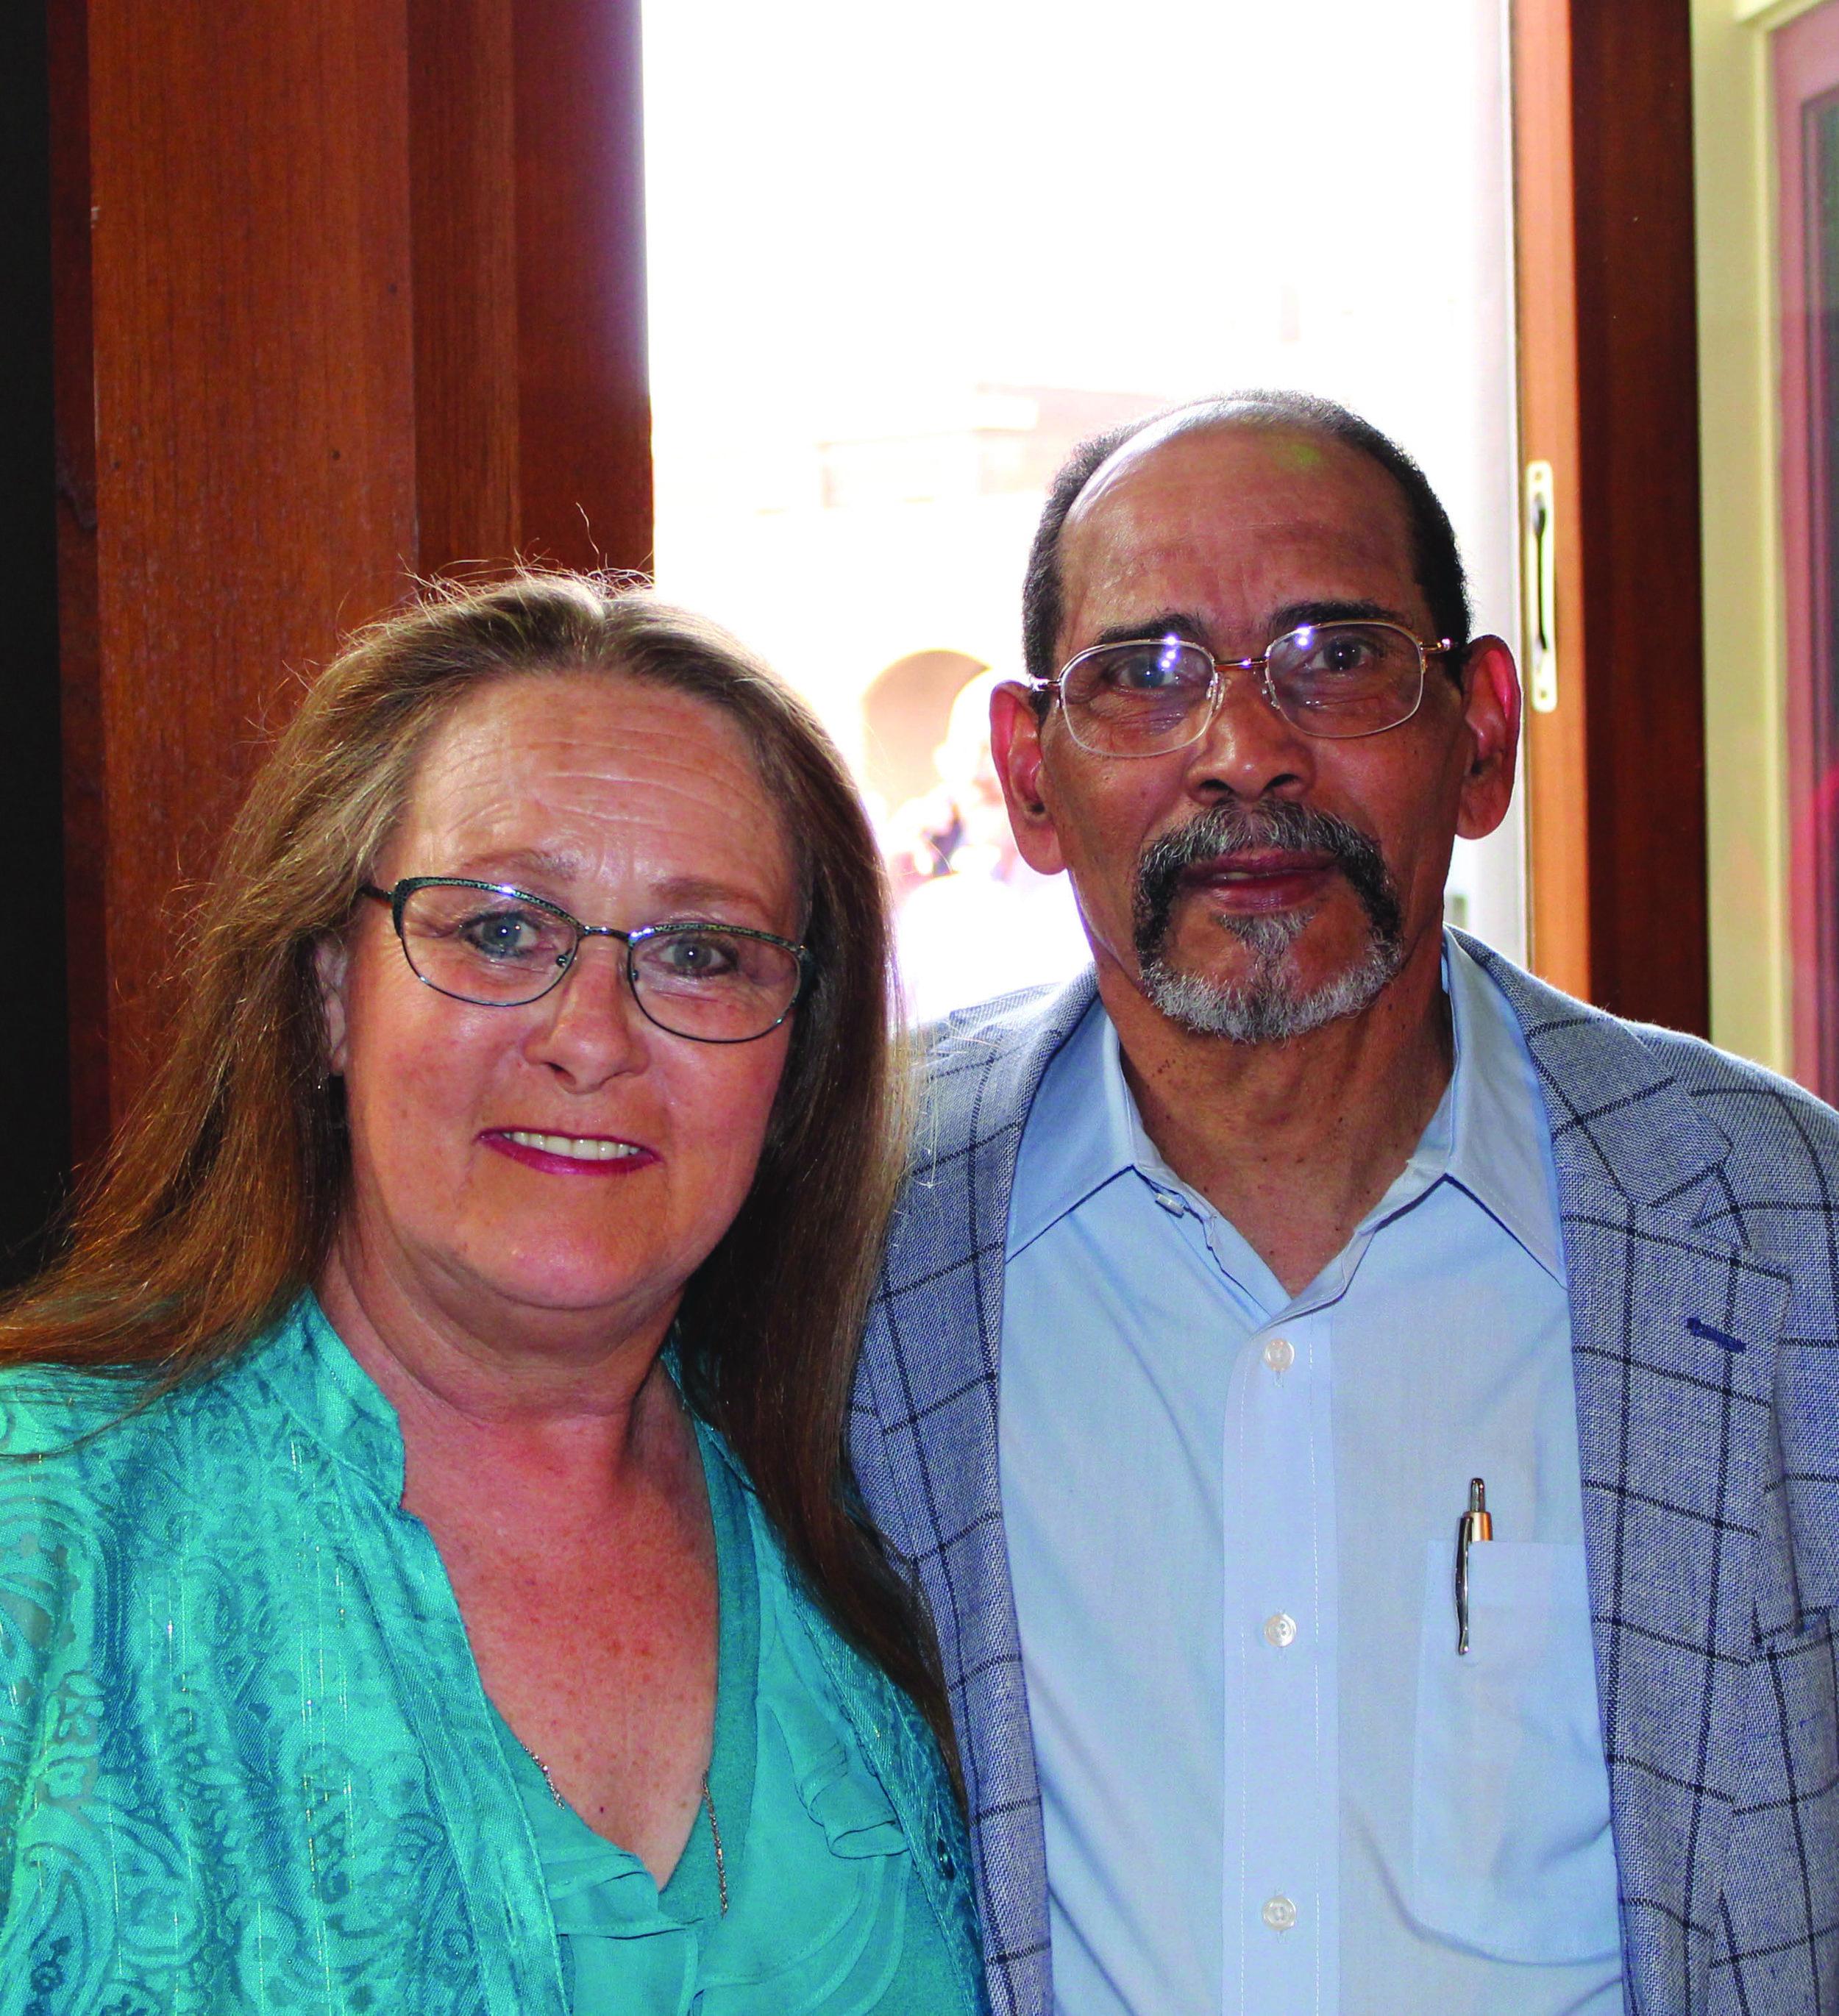 Cathy Pennington and Nole Coco